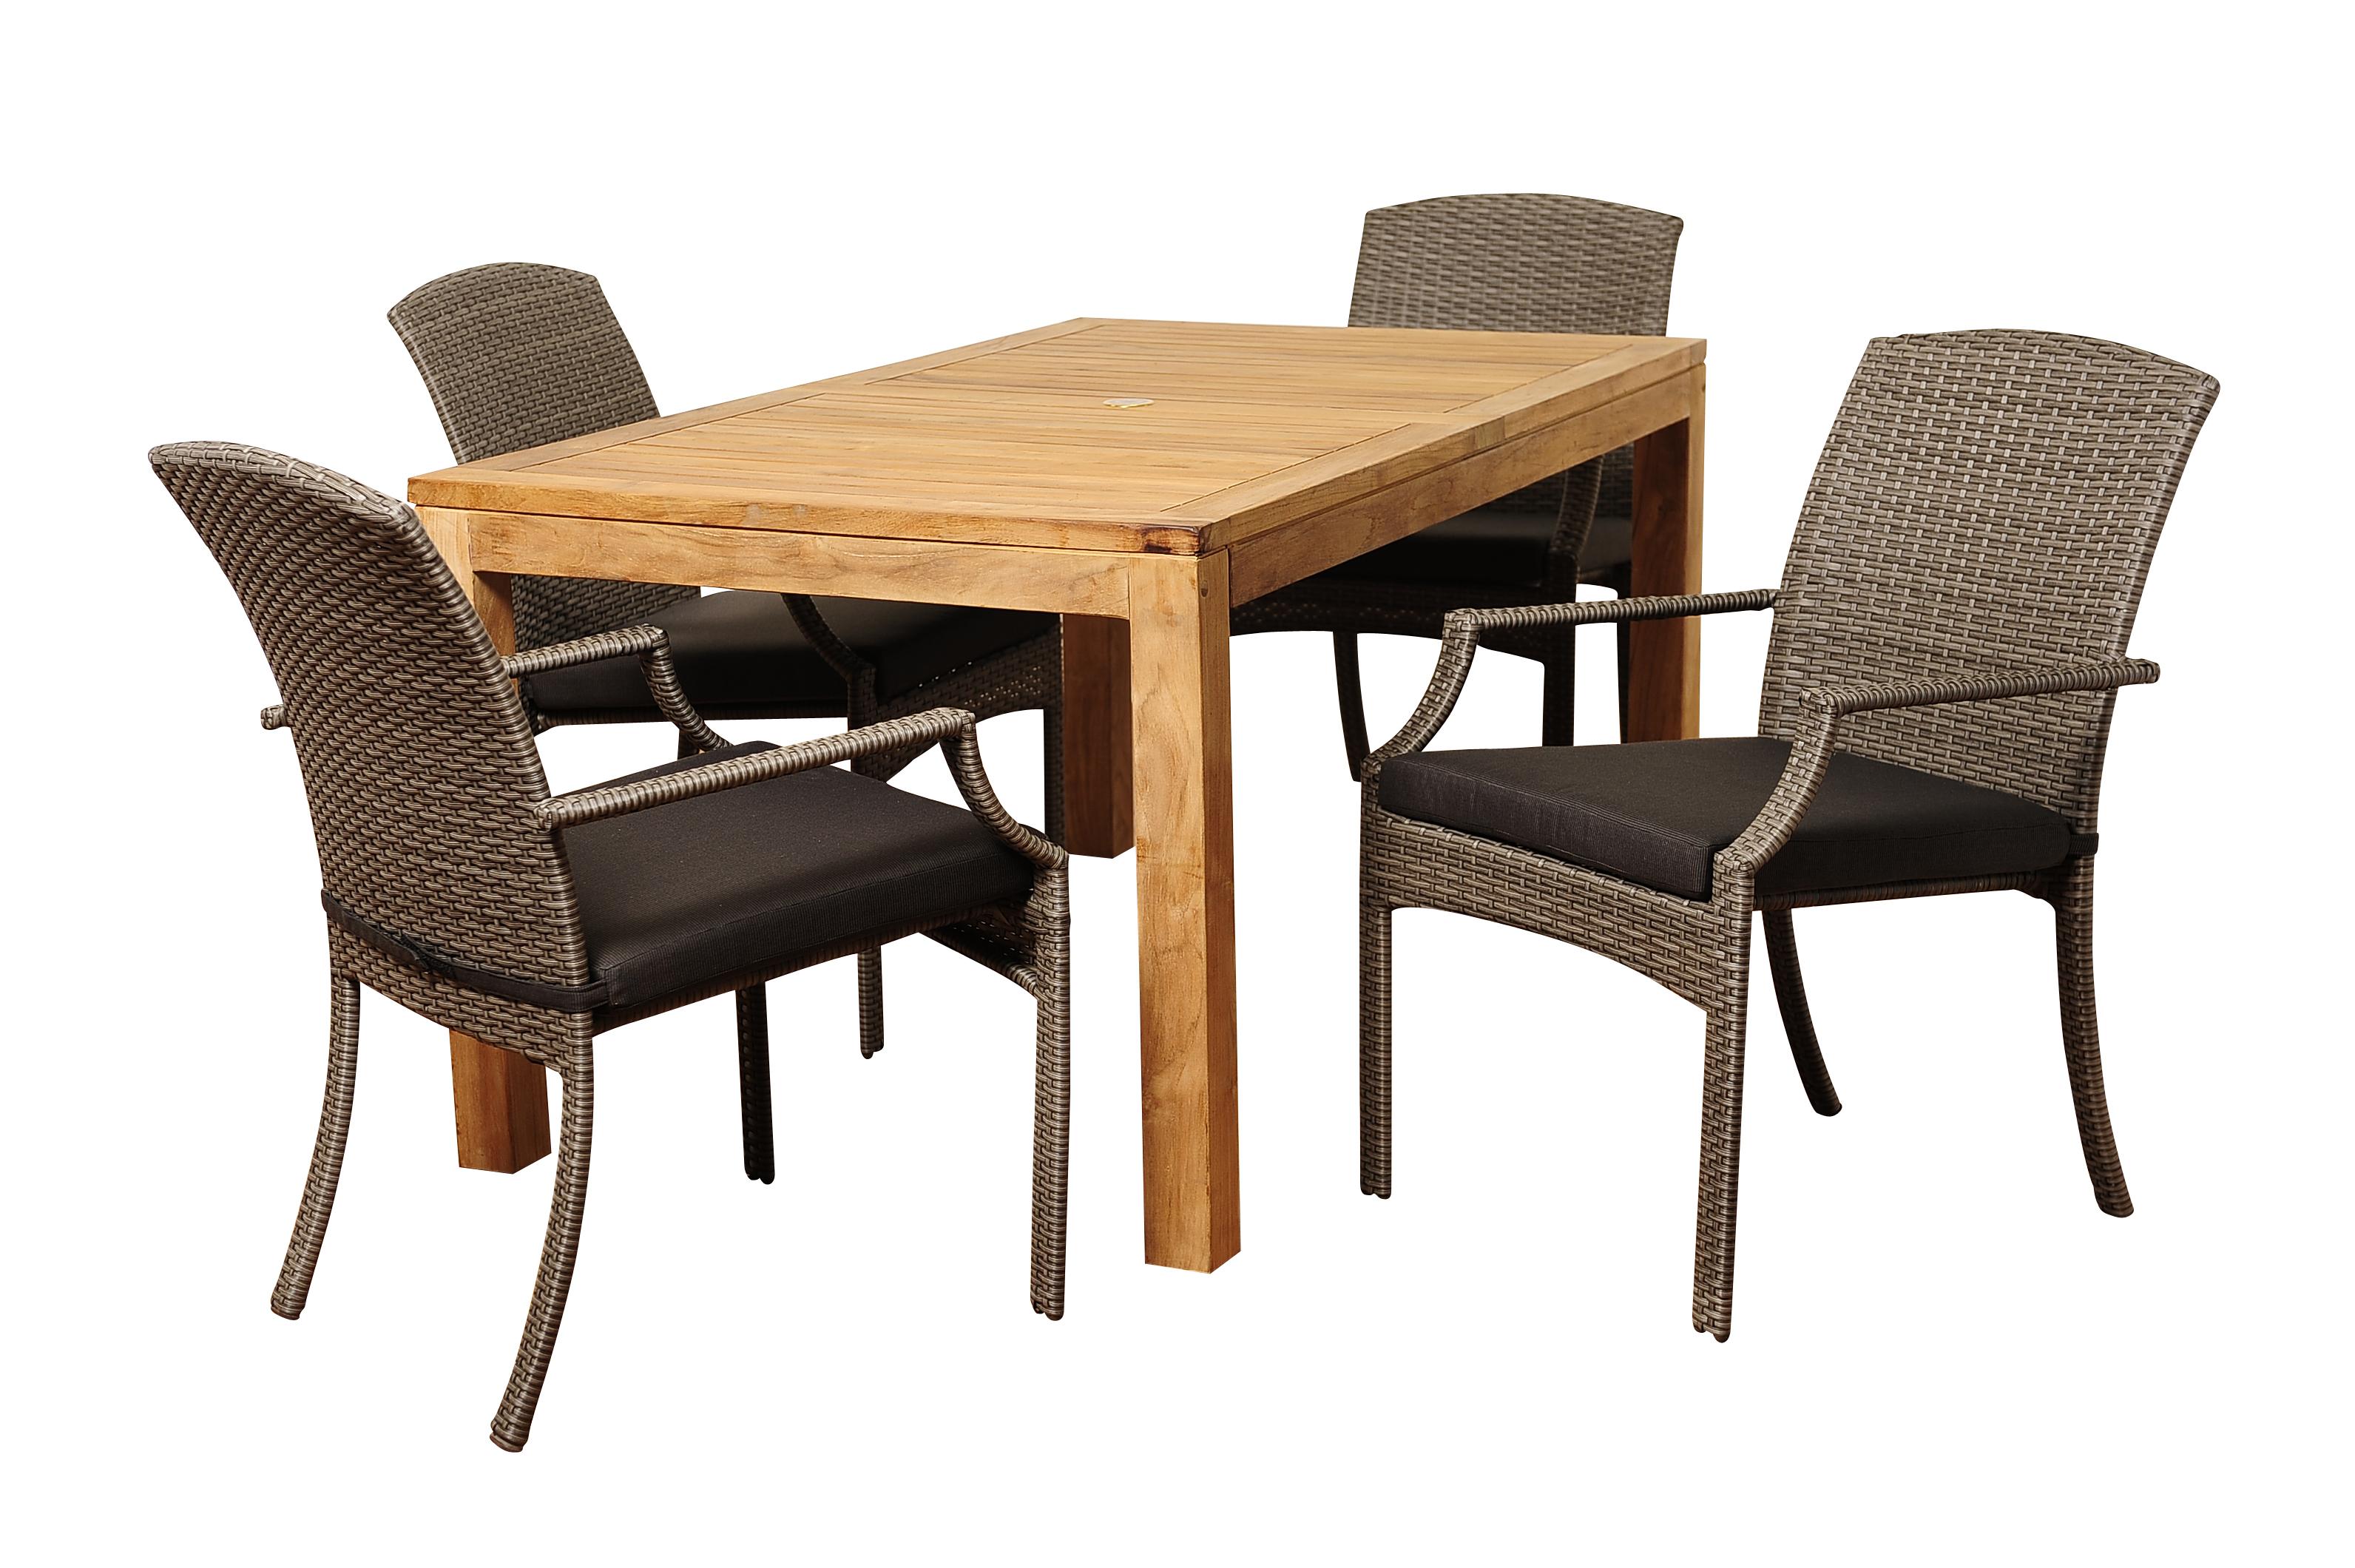 Shelton 5 Piece Teak Wicker Rectangular Dining Set With Grey Cushions Garde